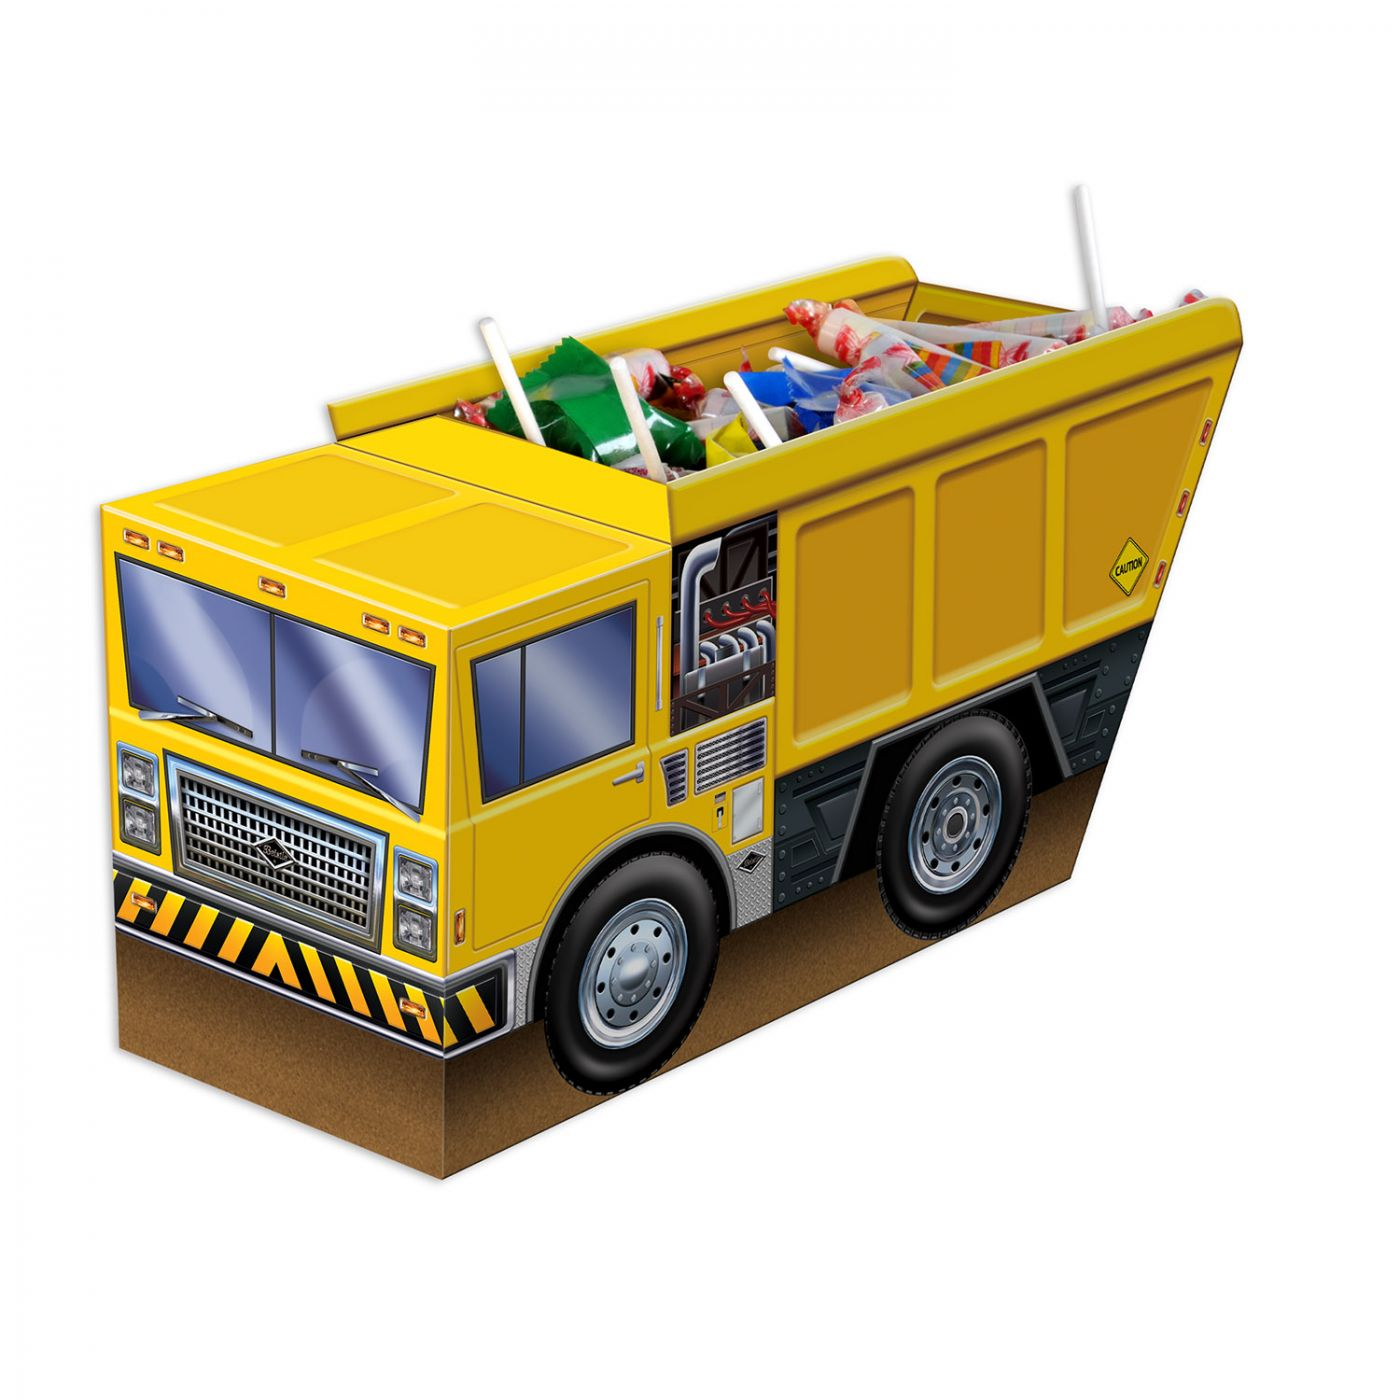 3-D Dump Truck Centerpiece image